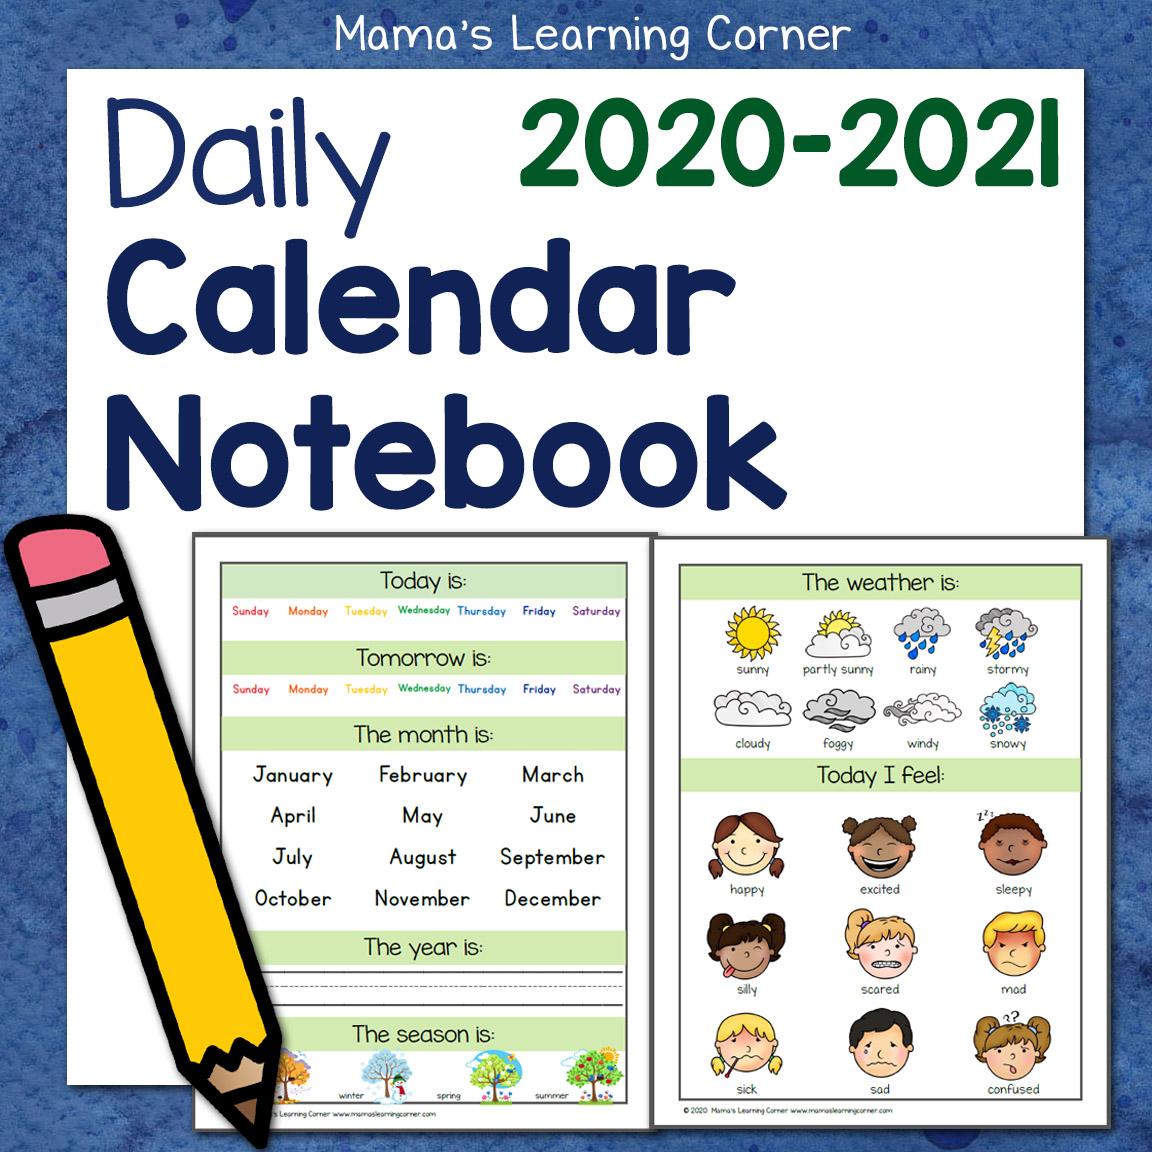 Notebook Test 2021